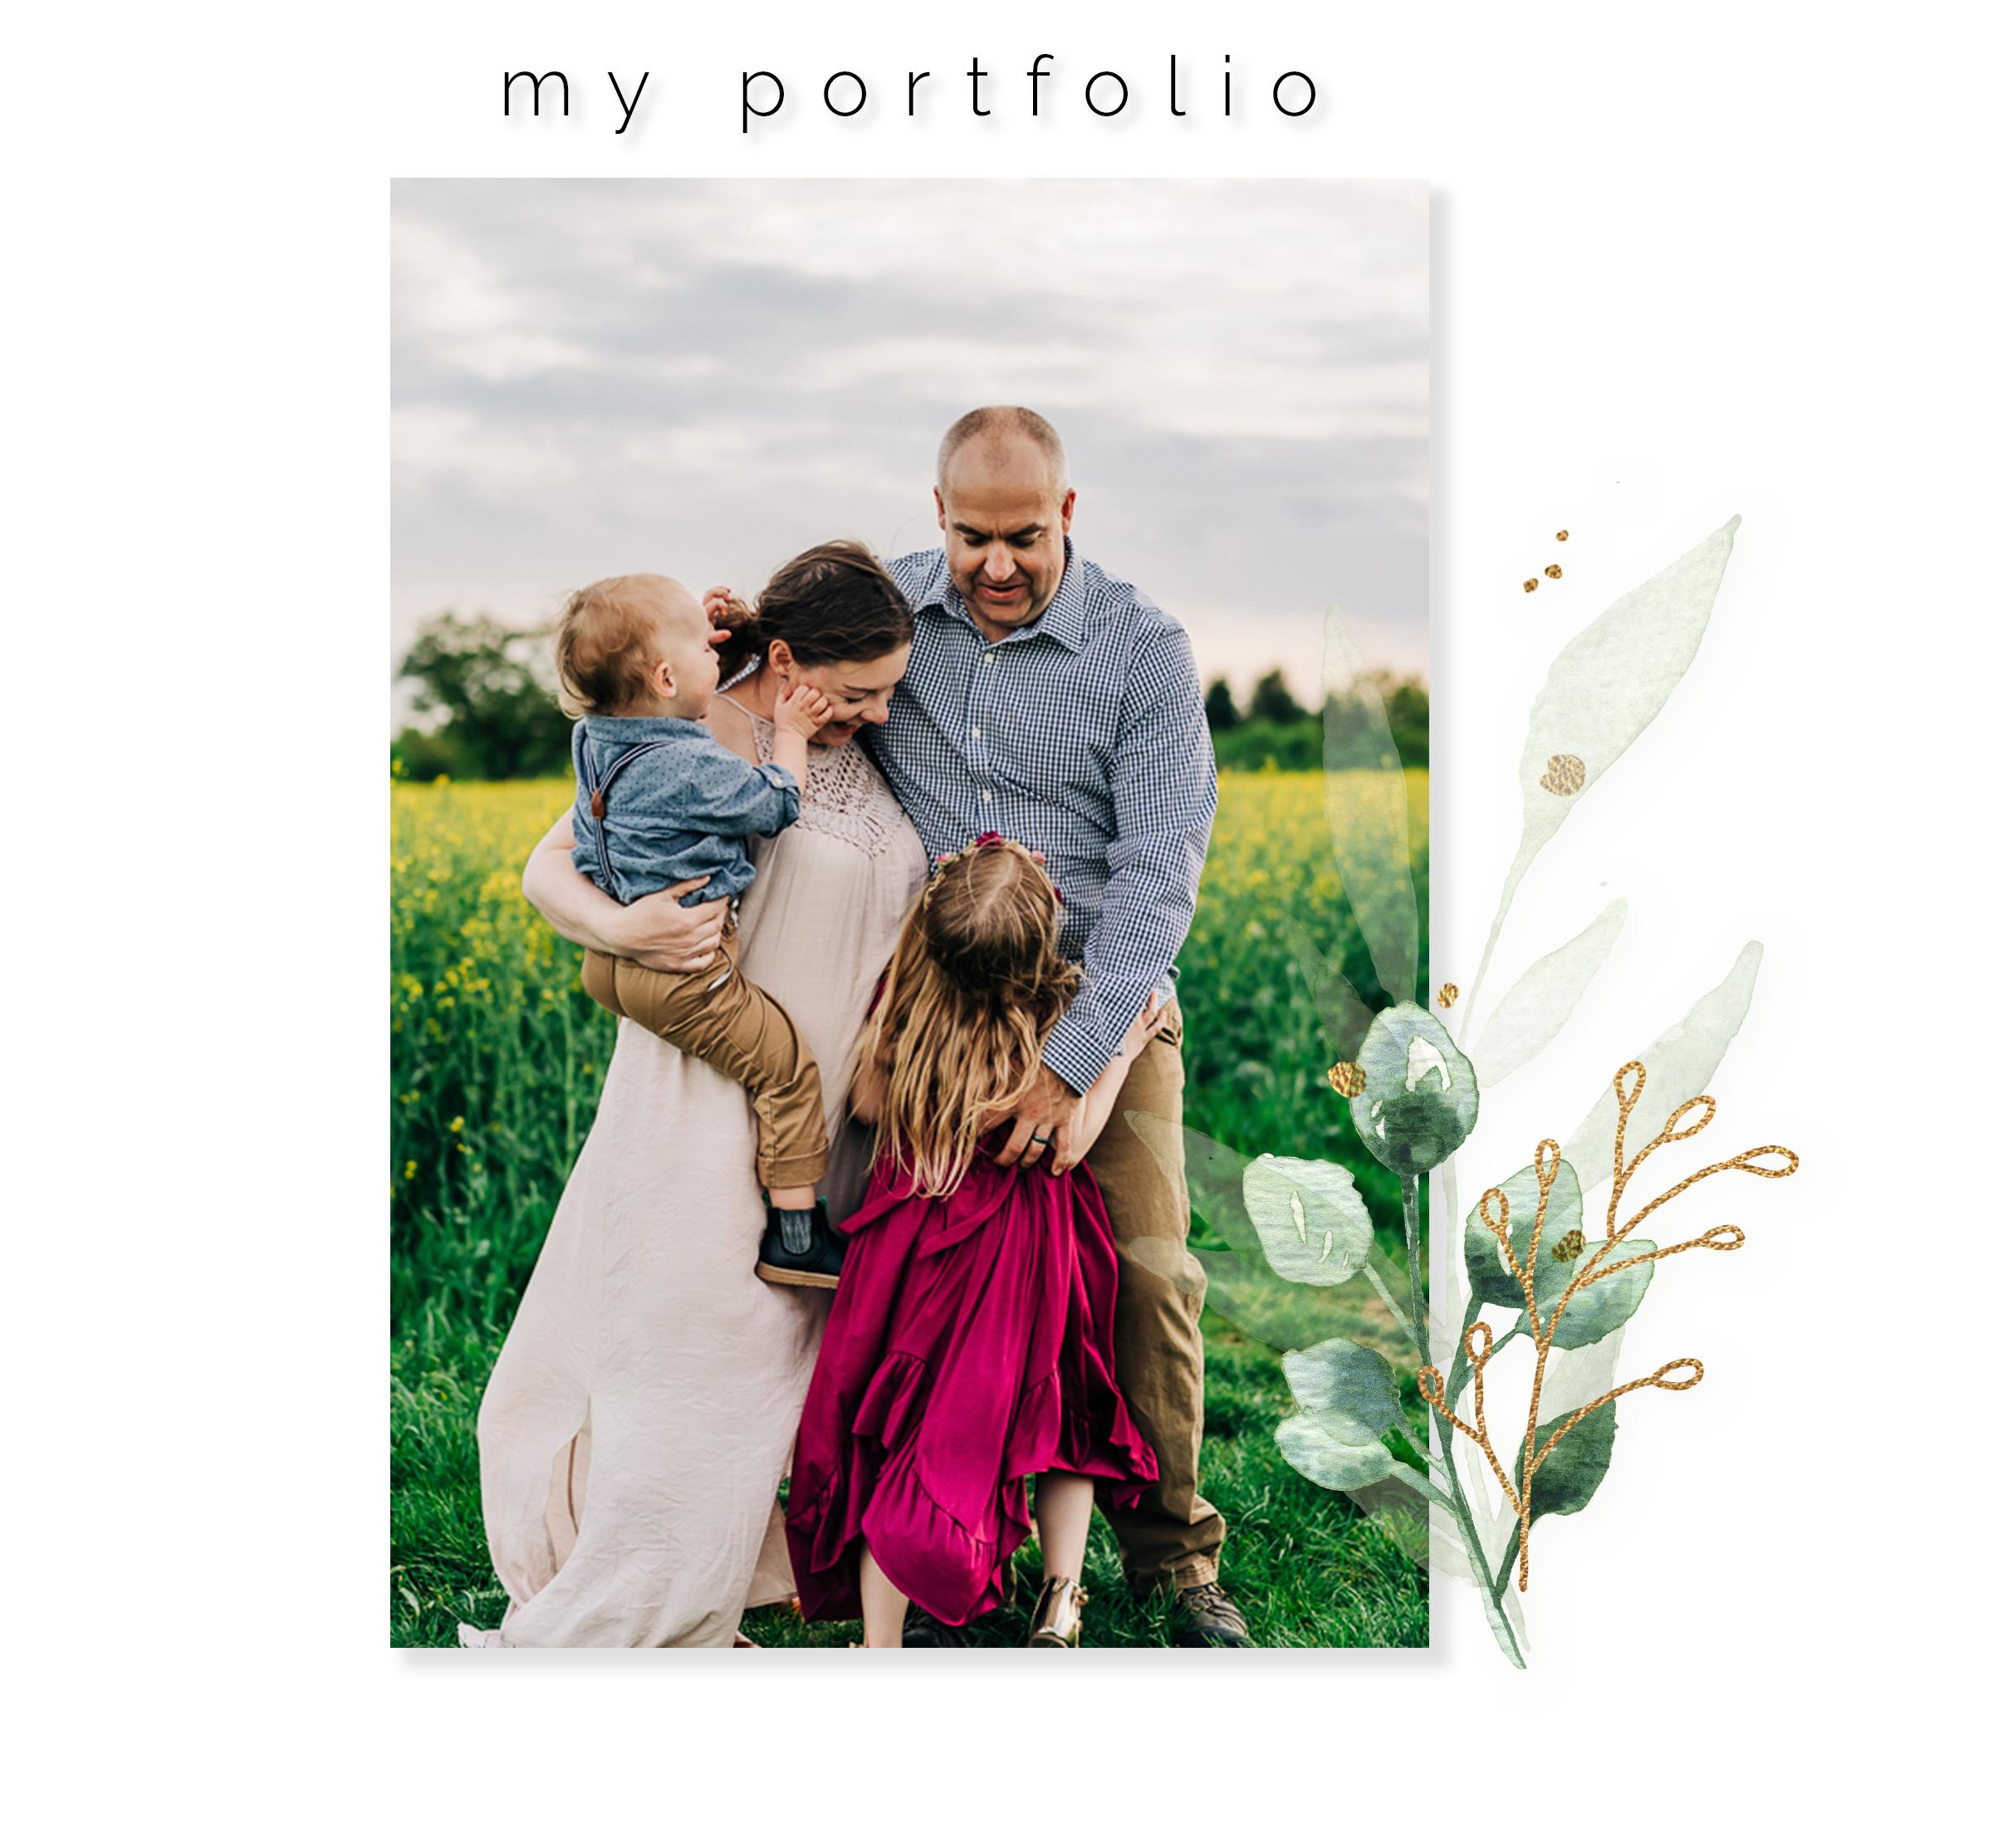 portfolio header image front page.png